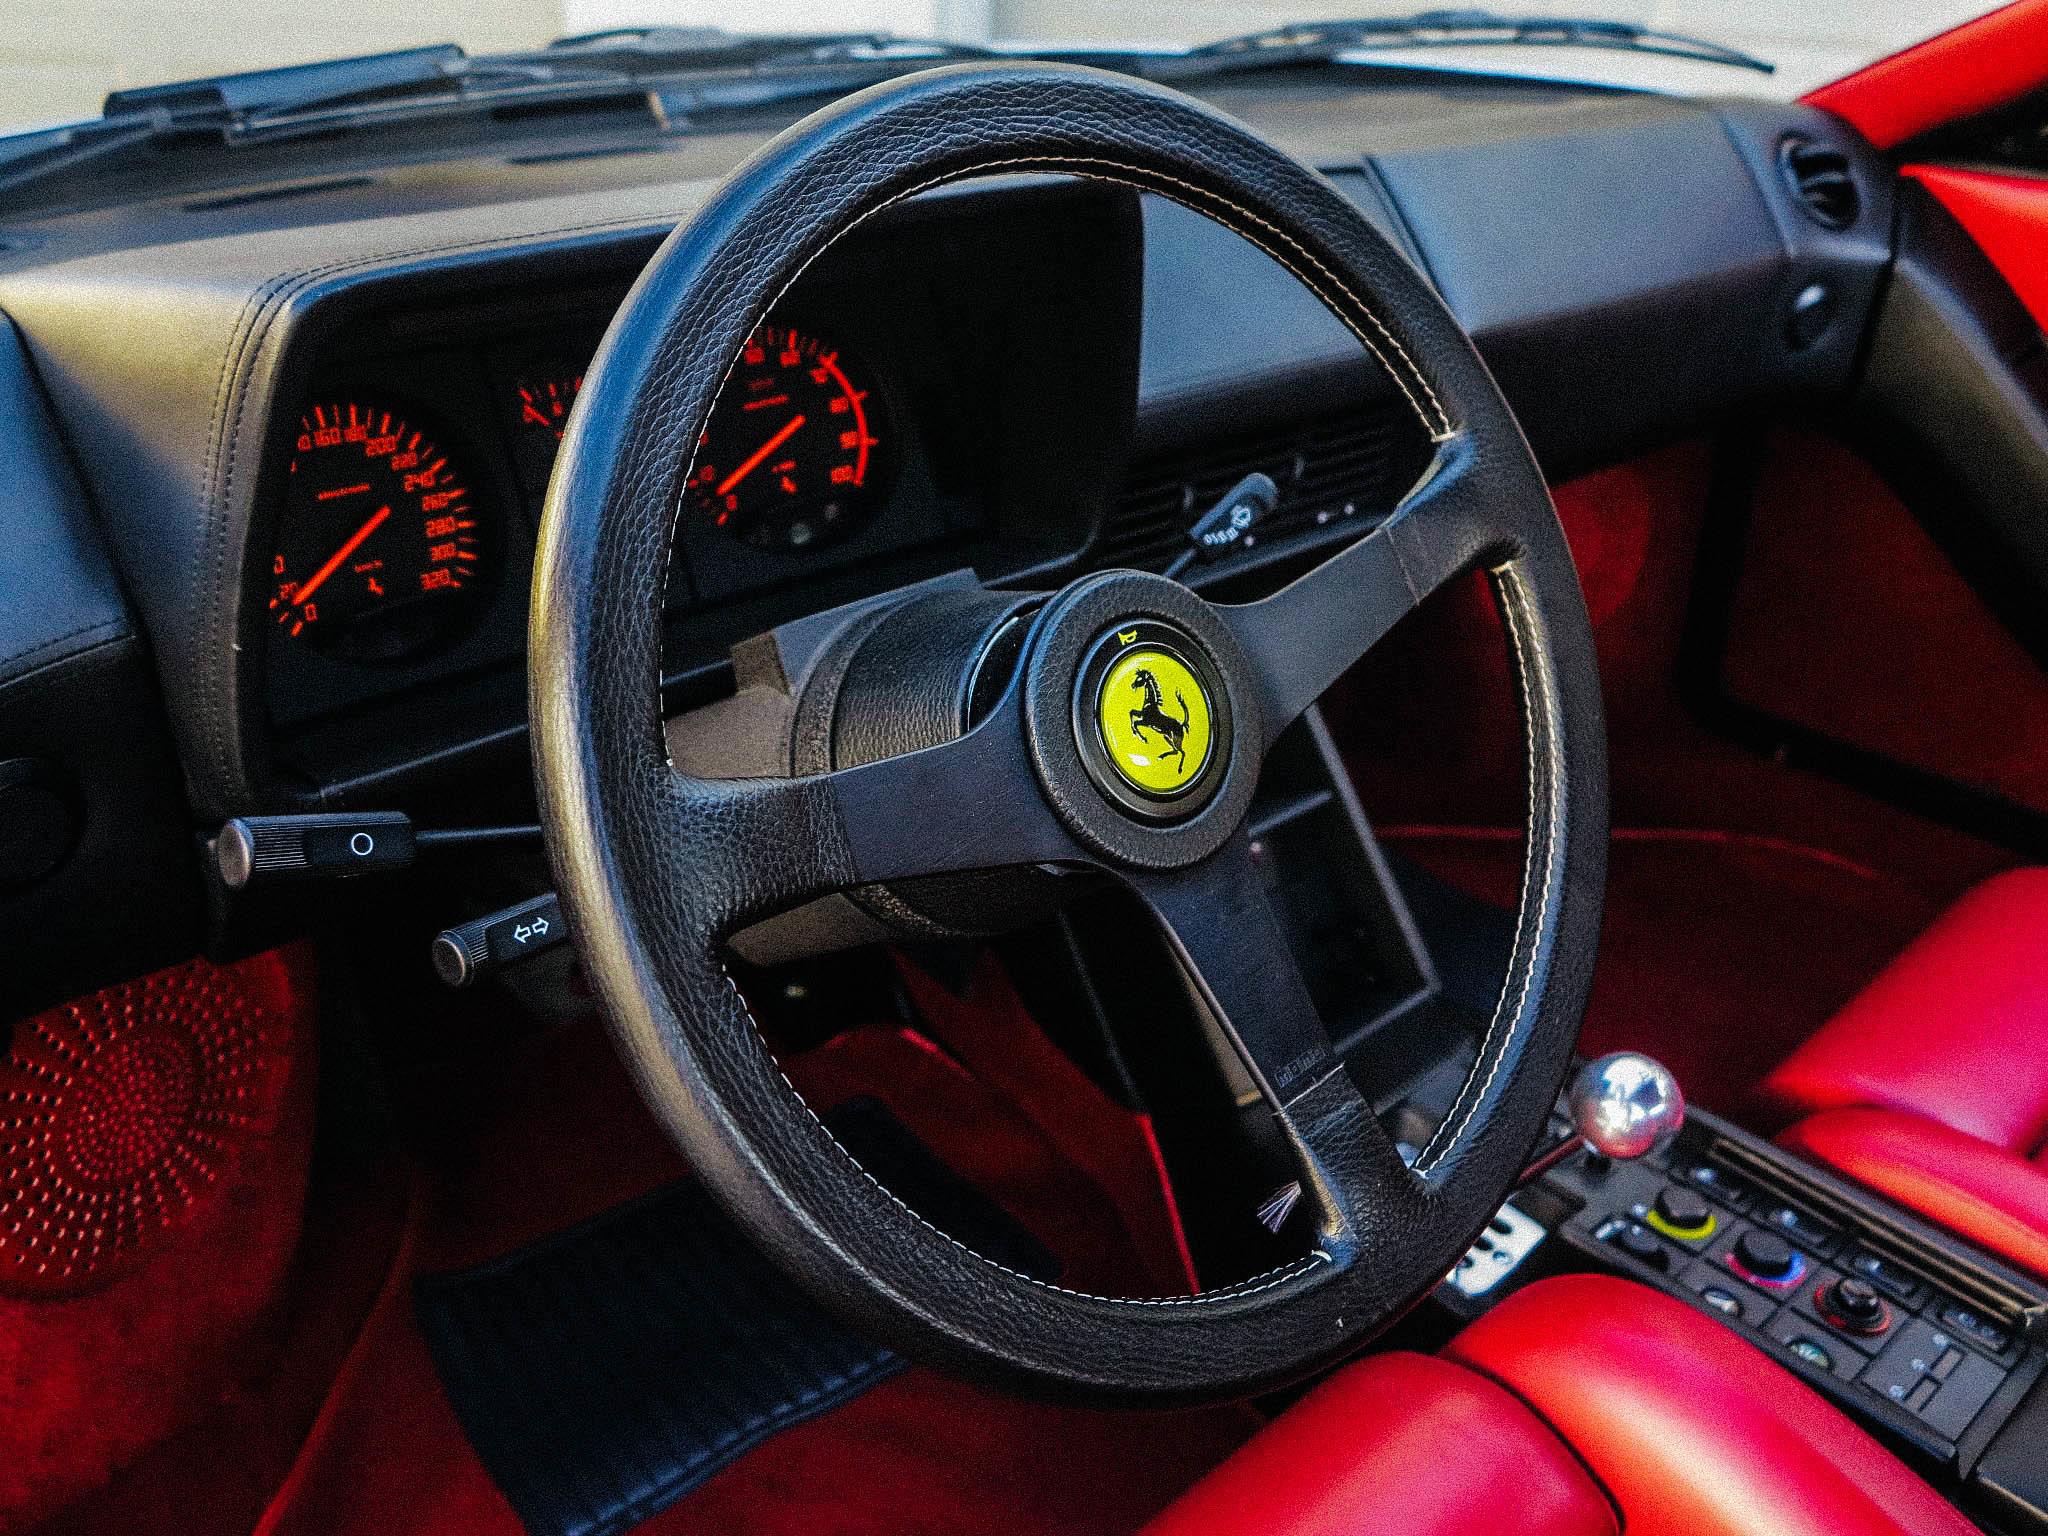 385_c6a723e057e81991ferraritestarossazffsm17a3m00874821145 Outstanding Ferrari Mondial 8 Sale south Africa Cars Trend